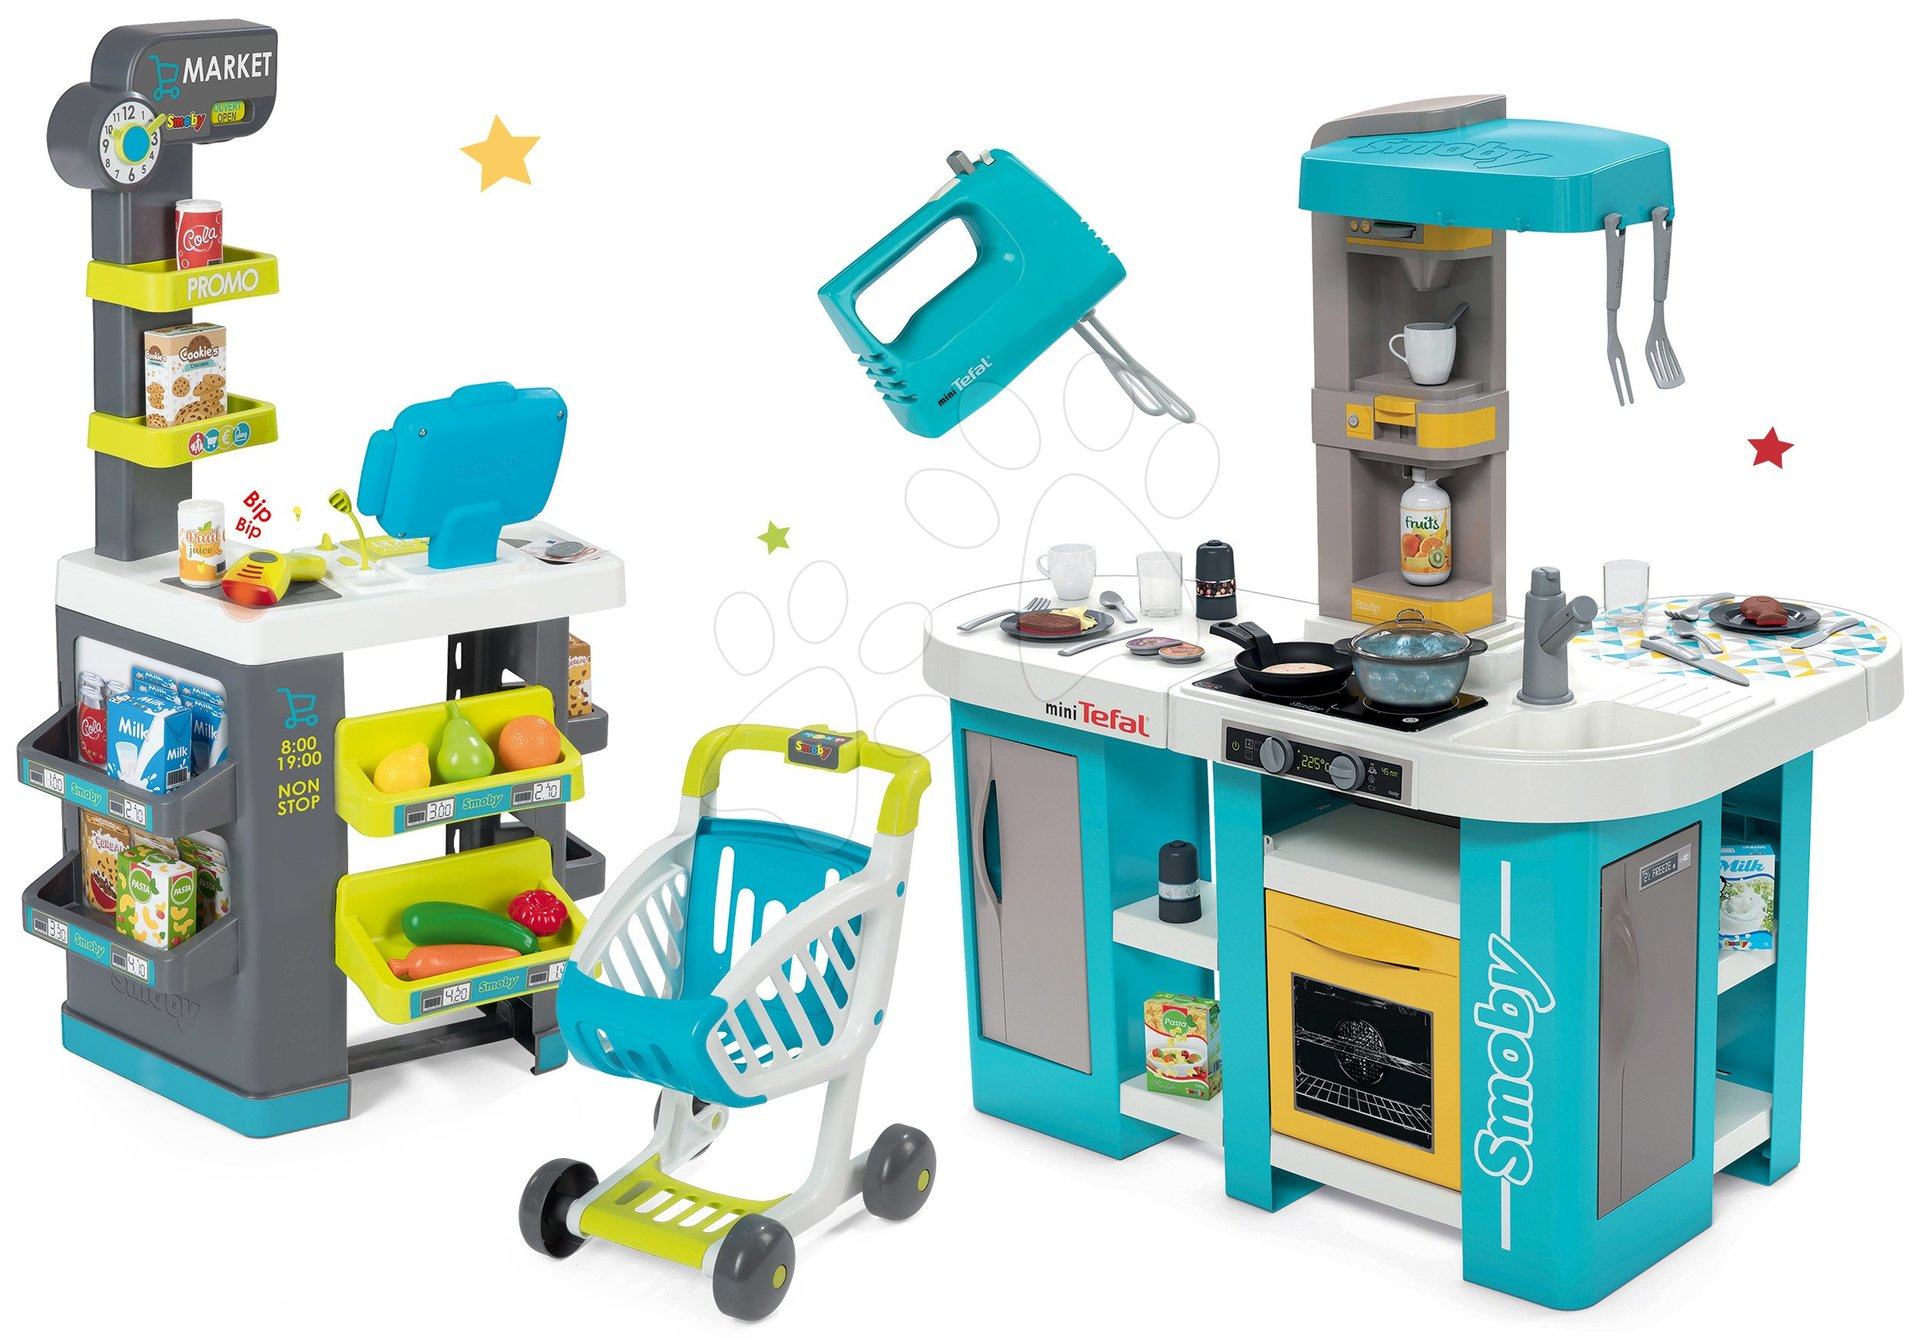 Set kuchyňka elektronická Tefal Studio 360° XL Bubble Smoby a obchod s potravinami Market a mixérem